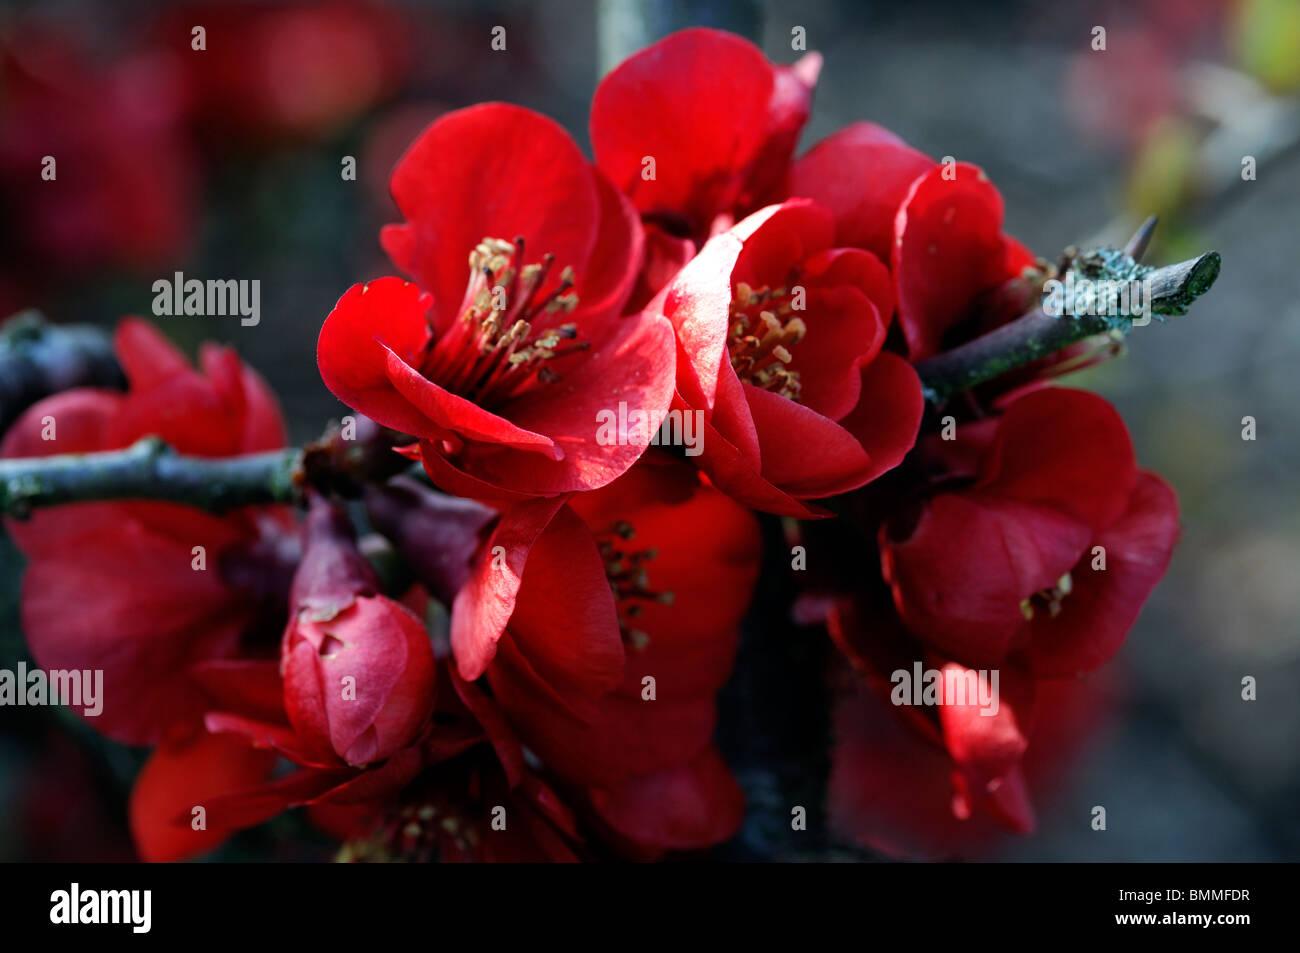 flowering quince chaenomeles speciosa etna cultivar hardy shrub red flowers spring flower bloom blossom stock - Quince Flower